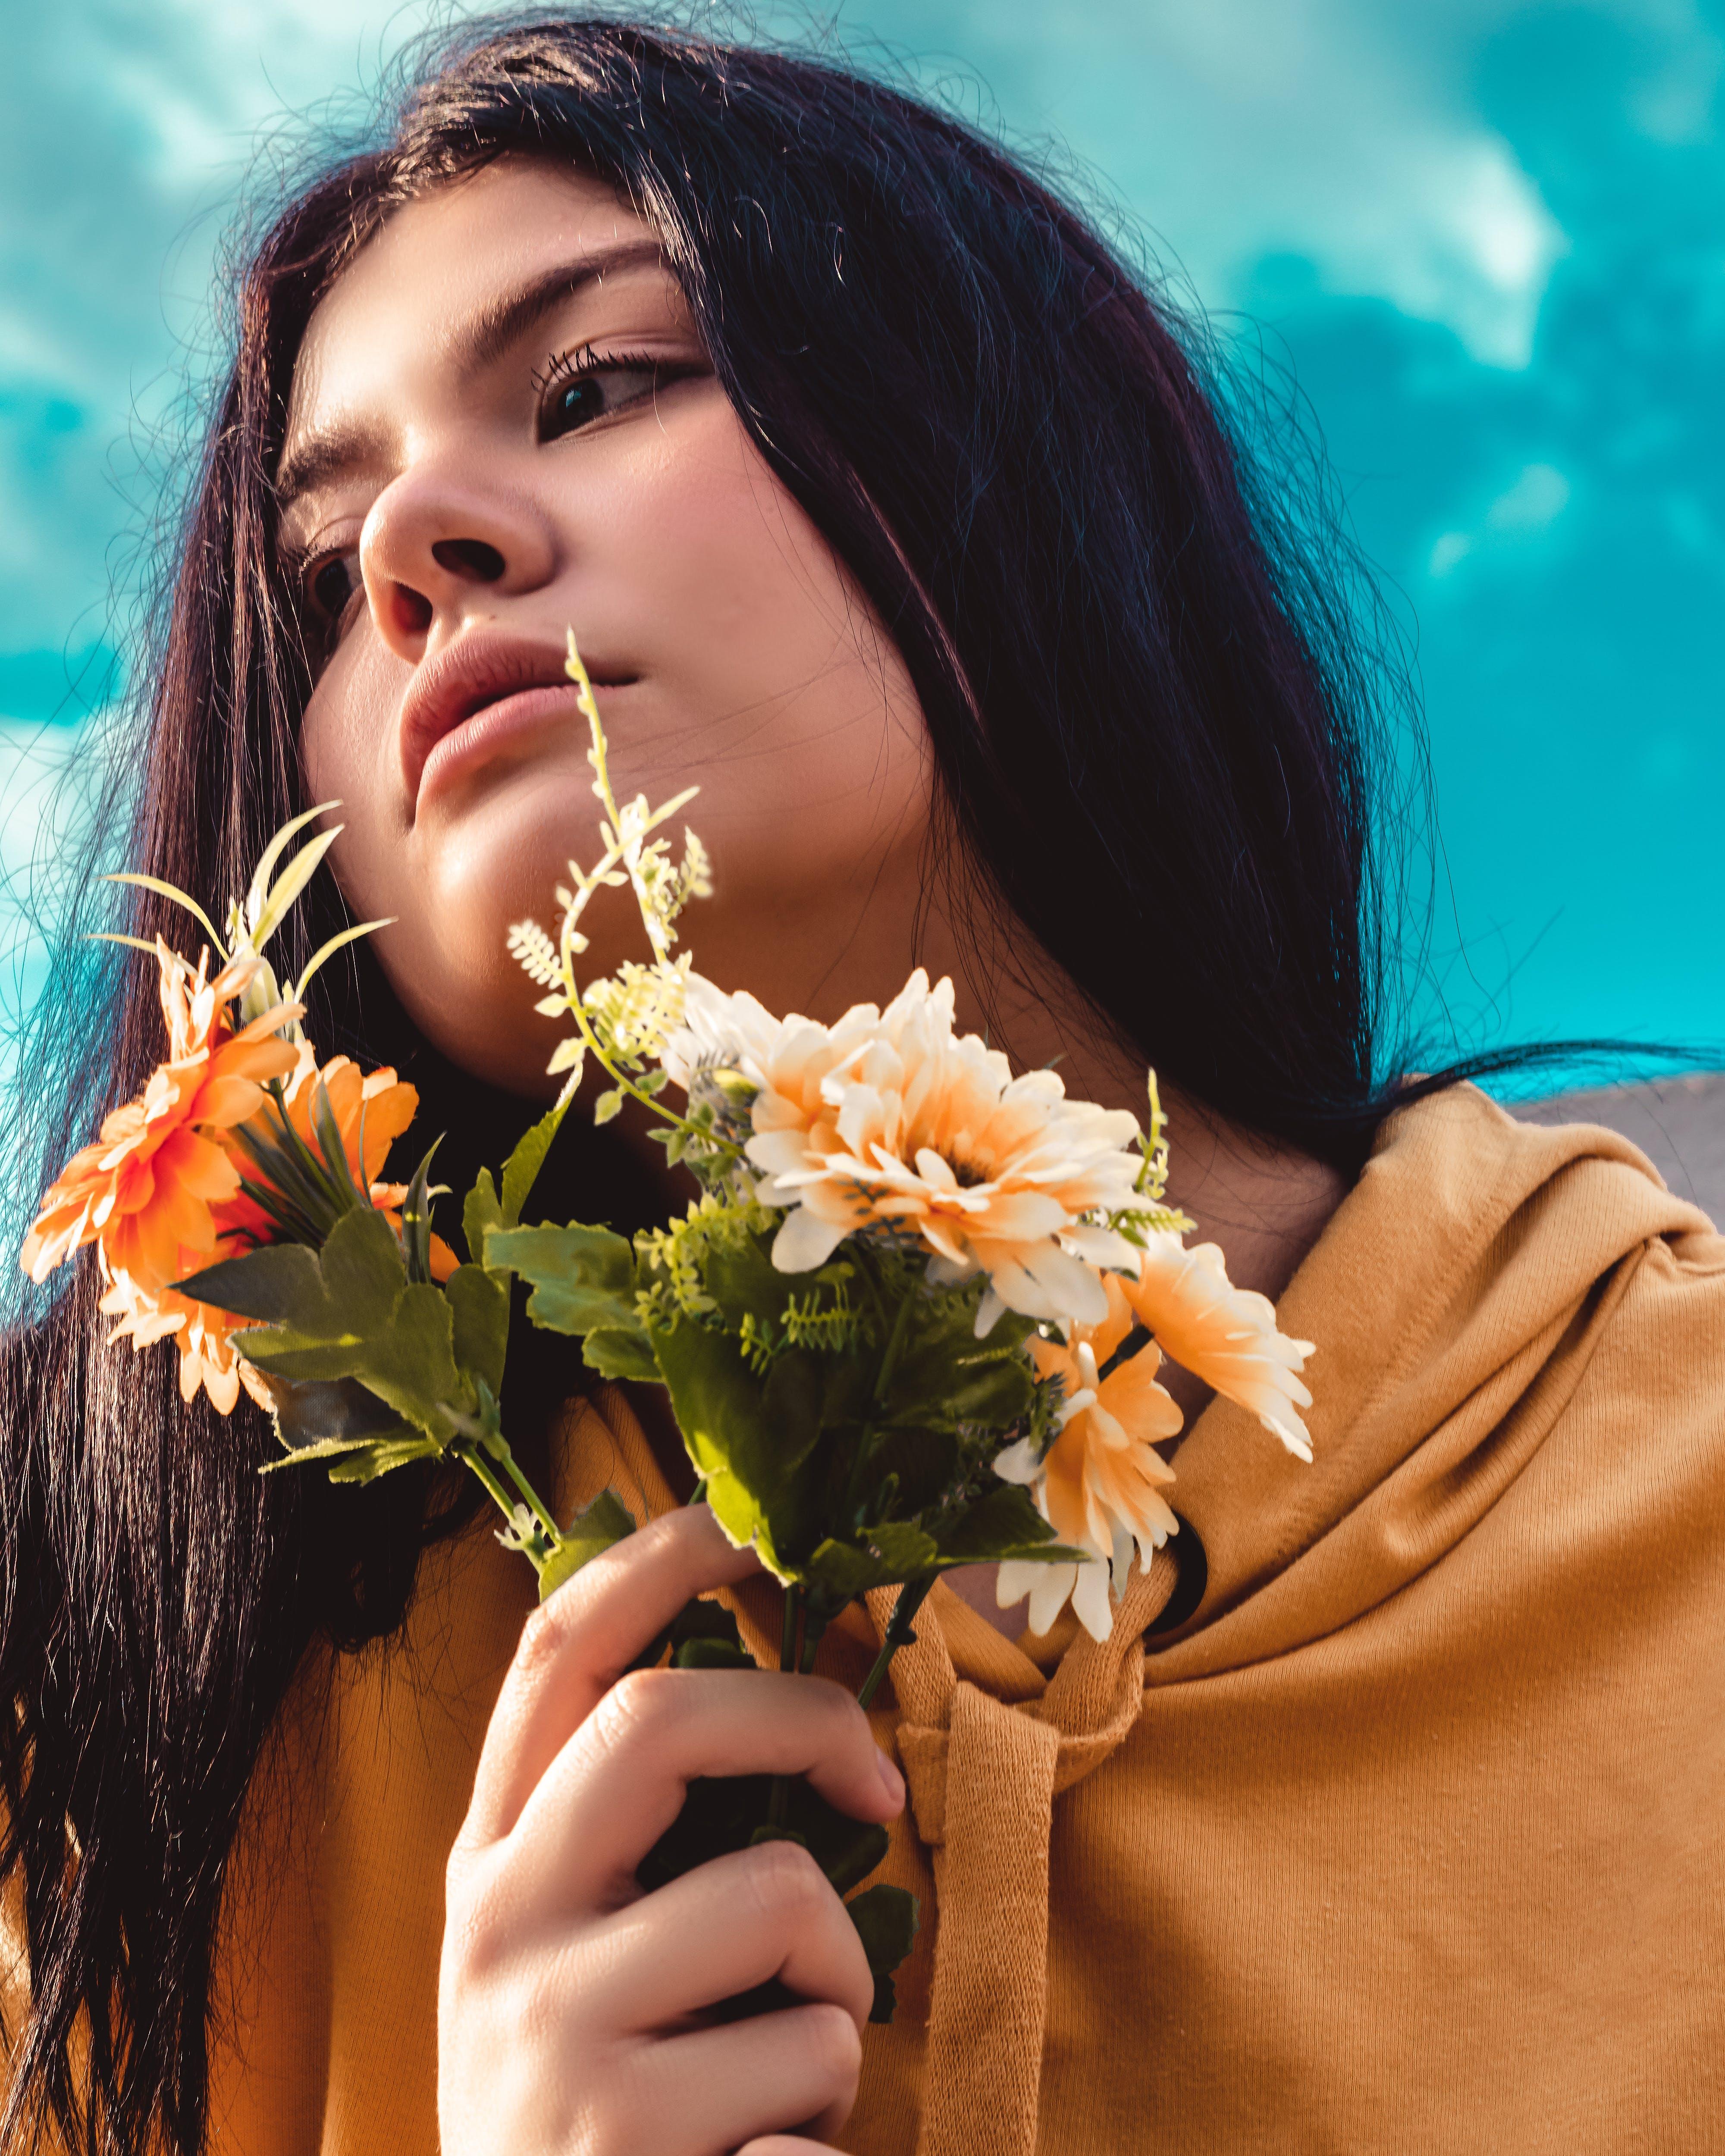 Free stock photo of beautiful flowers, female model, heaven, portrait photography